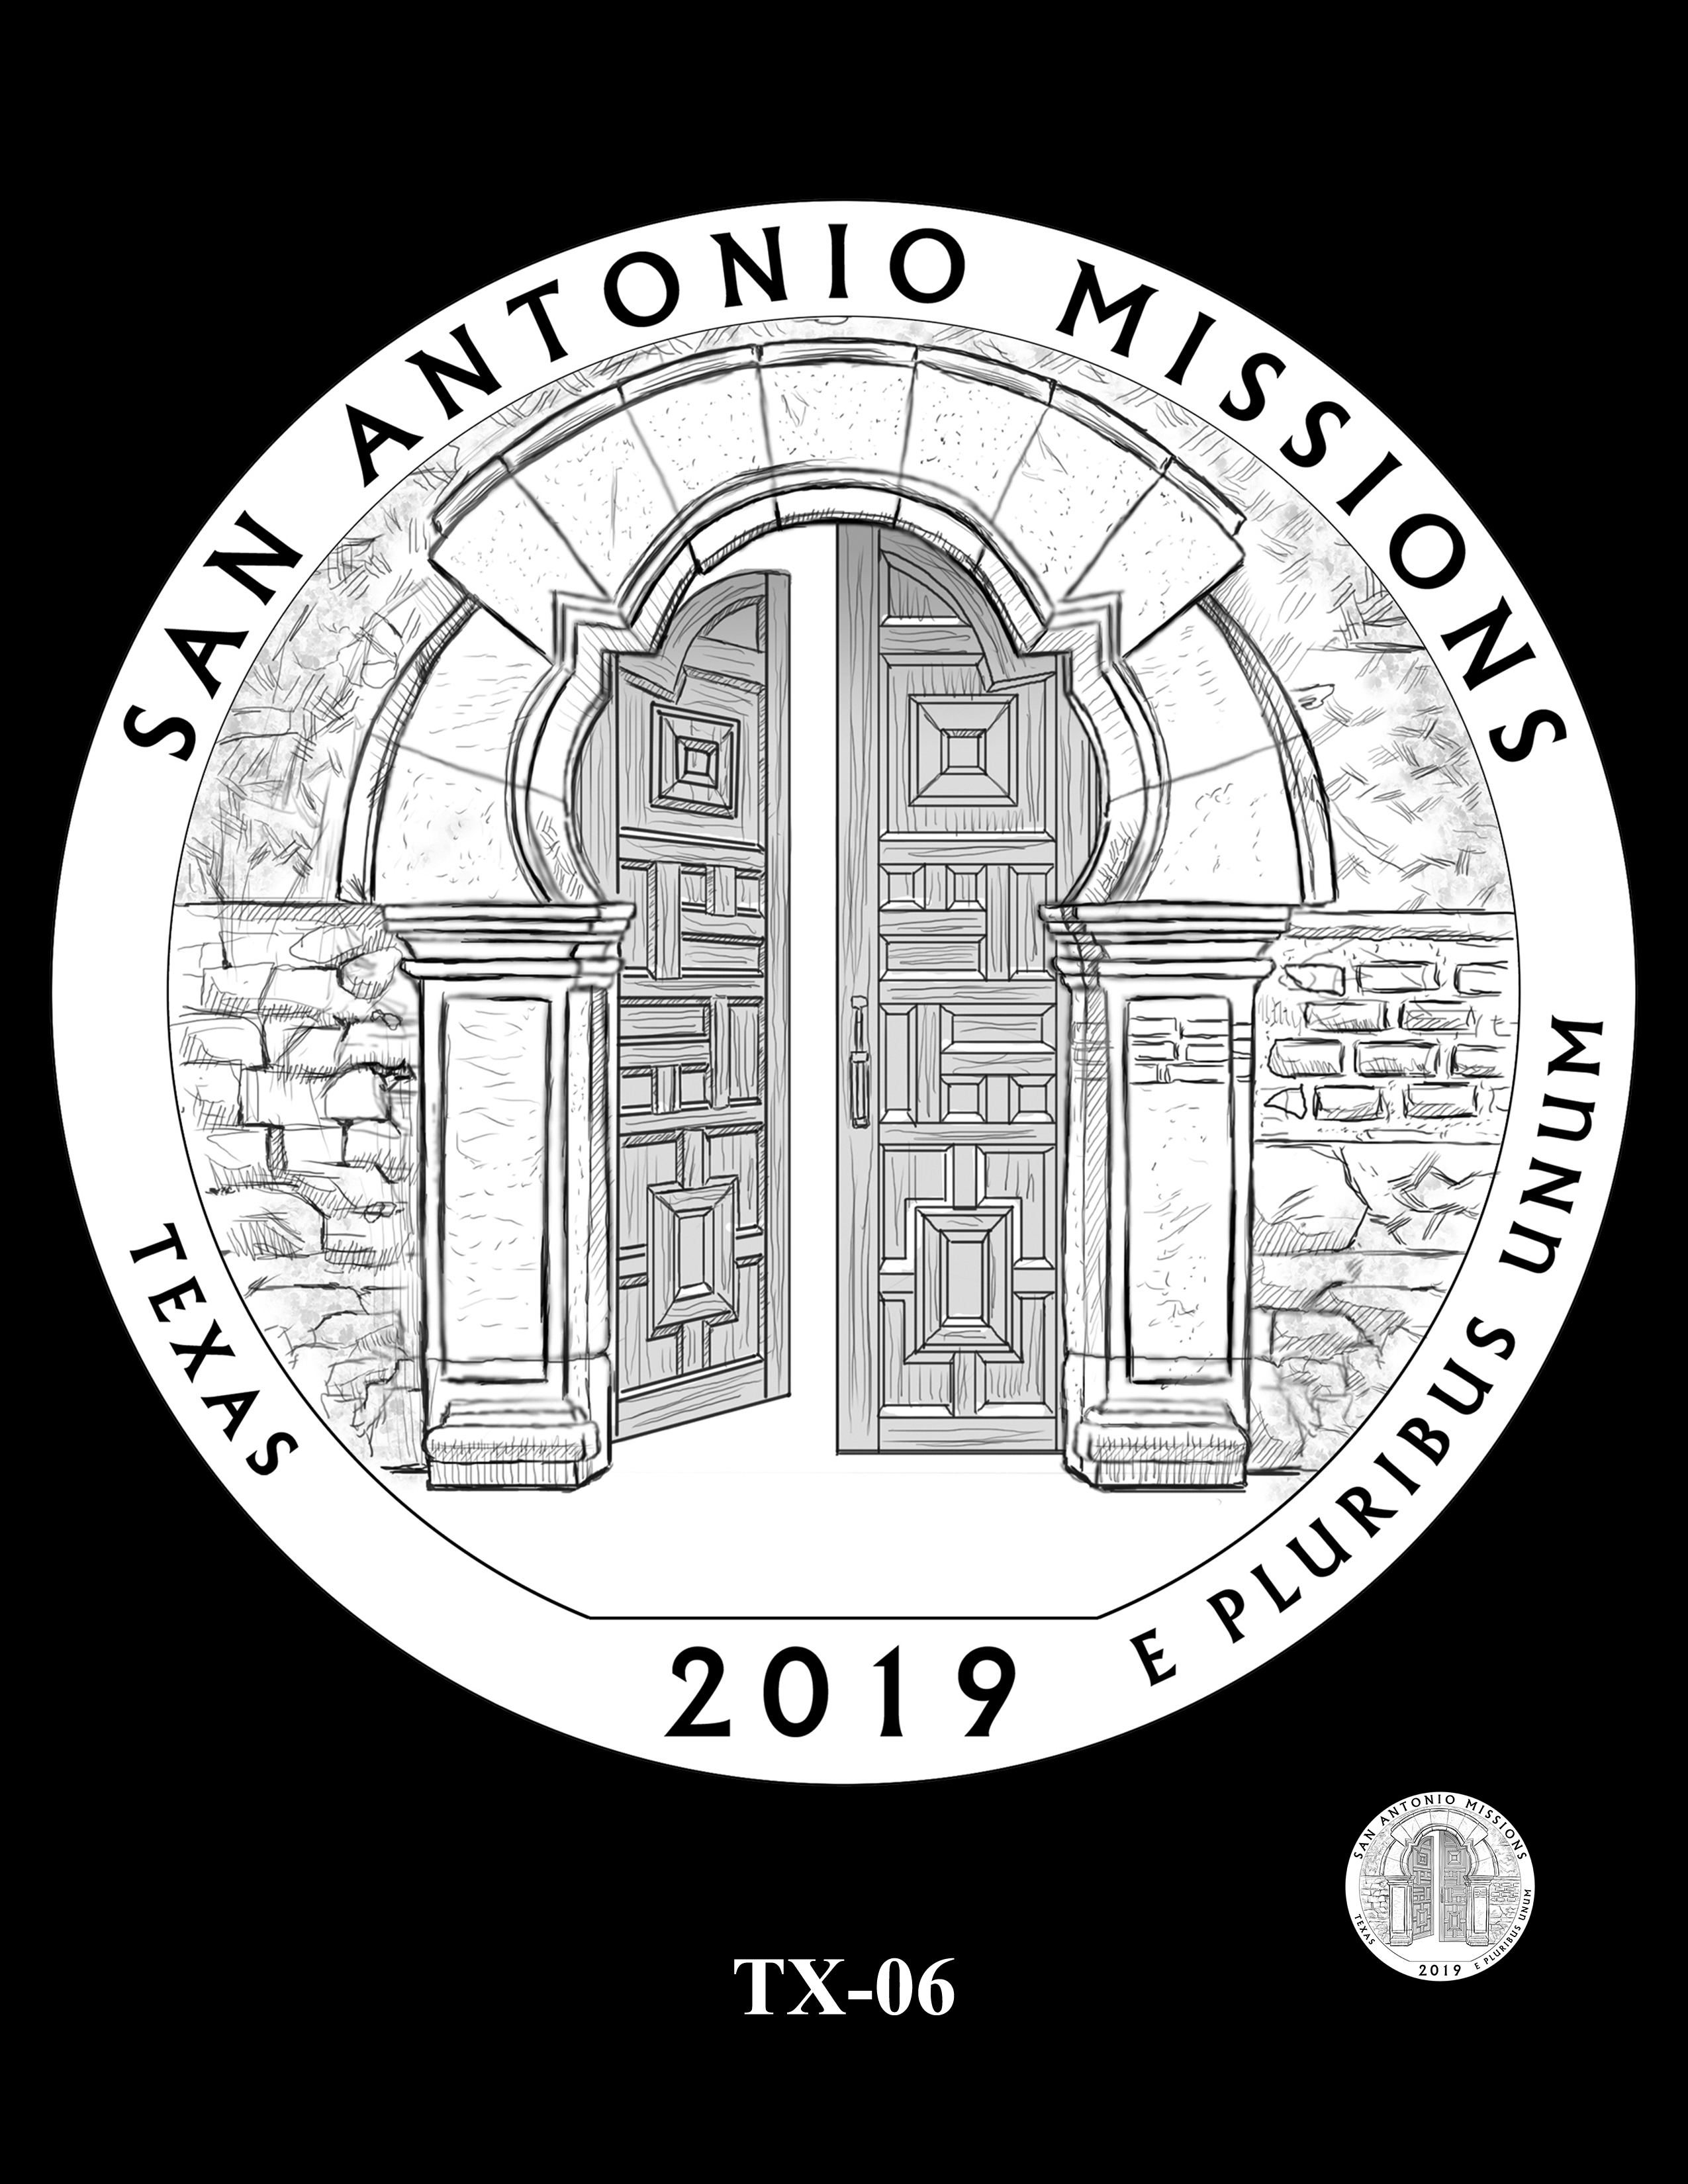 TX-06 -- 2019 America the Beautiful Quarters® Program